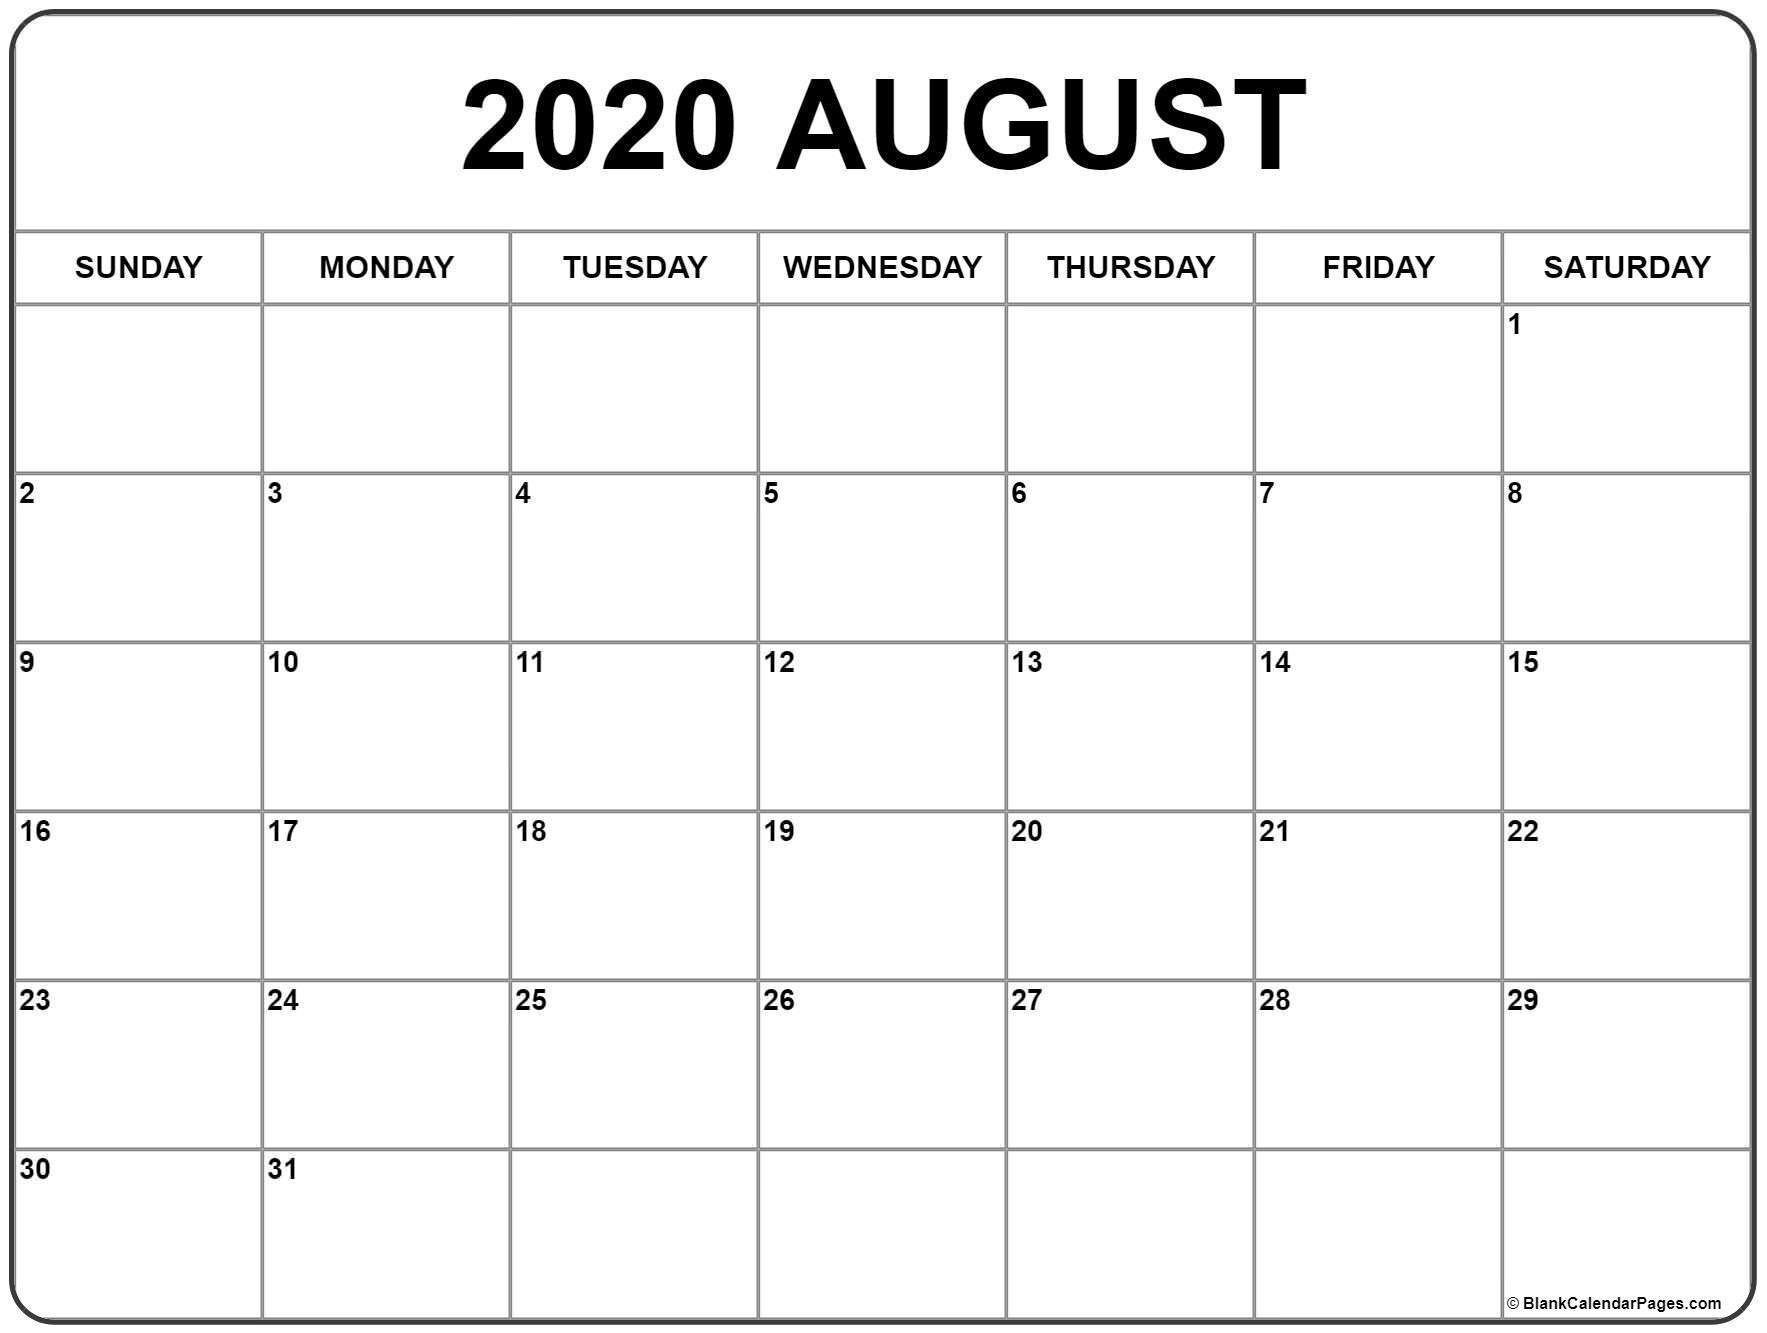 August 2020 Calendar | Free Printable Monthly Calendars inside June July August 2020 Calendar